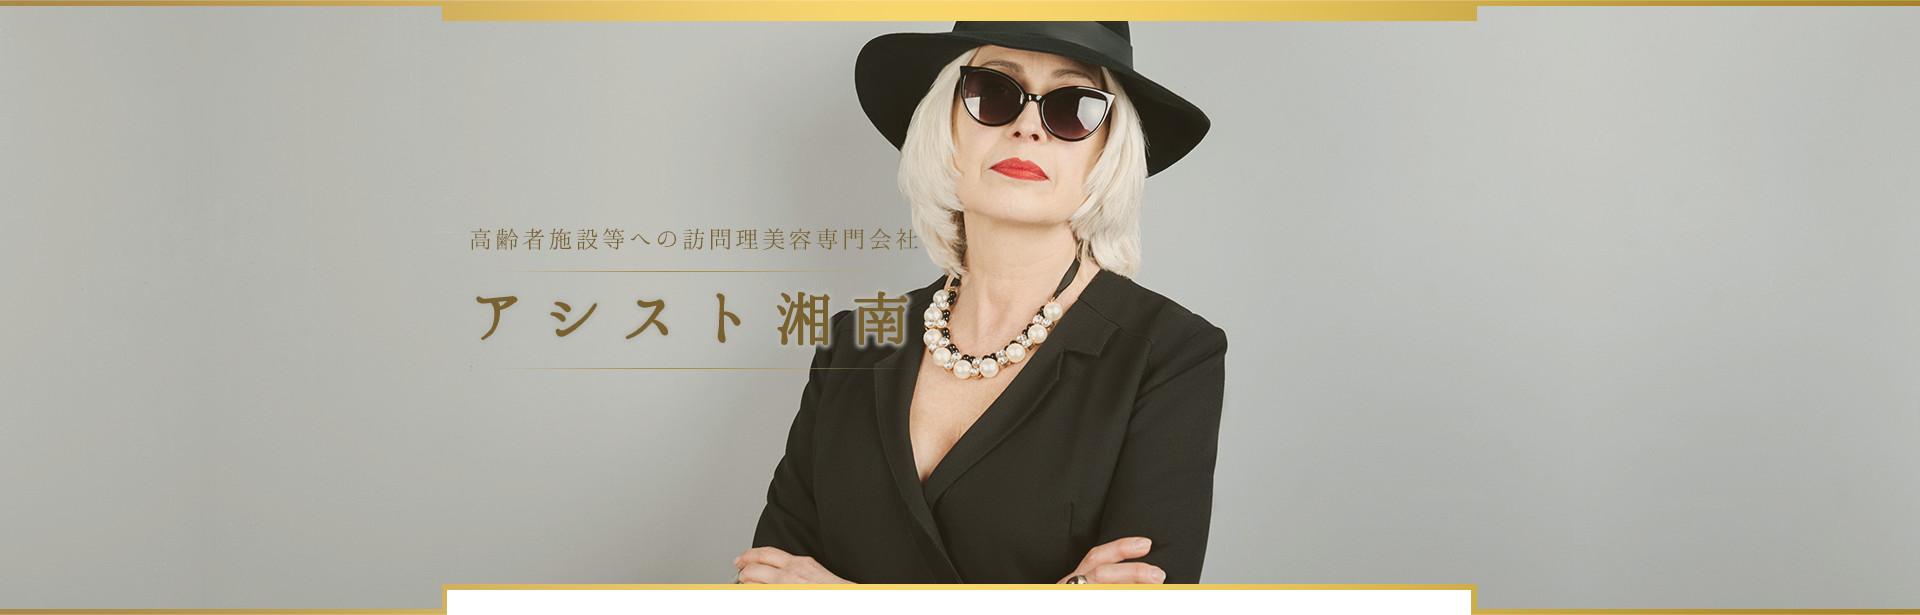 高齢者施設等への訪問理美容専門会社 アシスト湘南